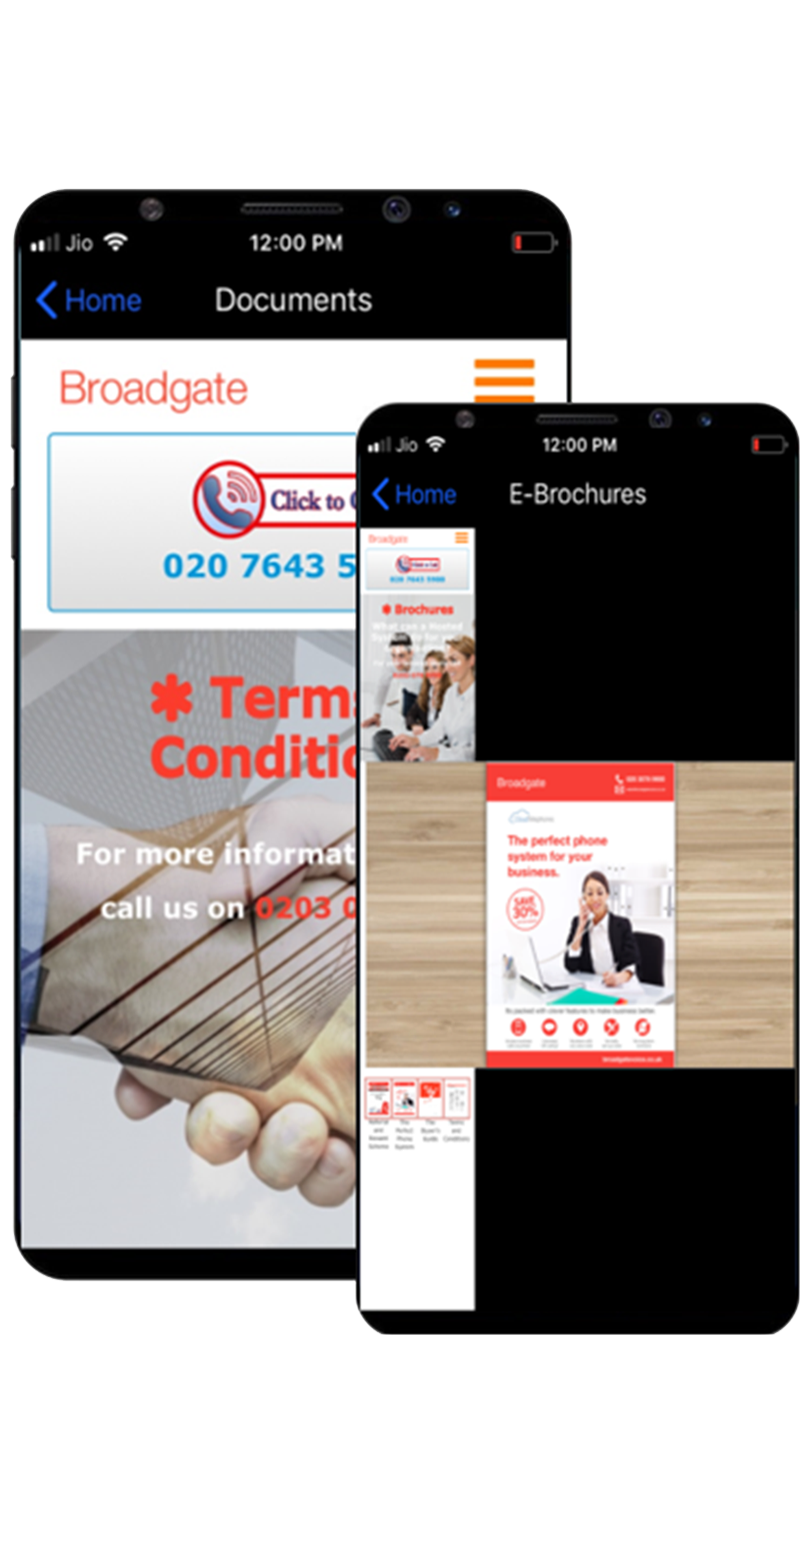 broadgate voice & data e-brochures